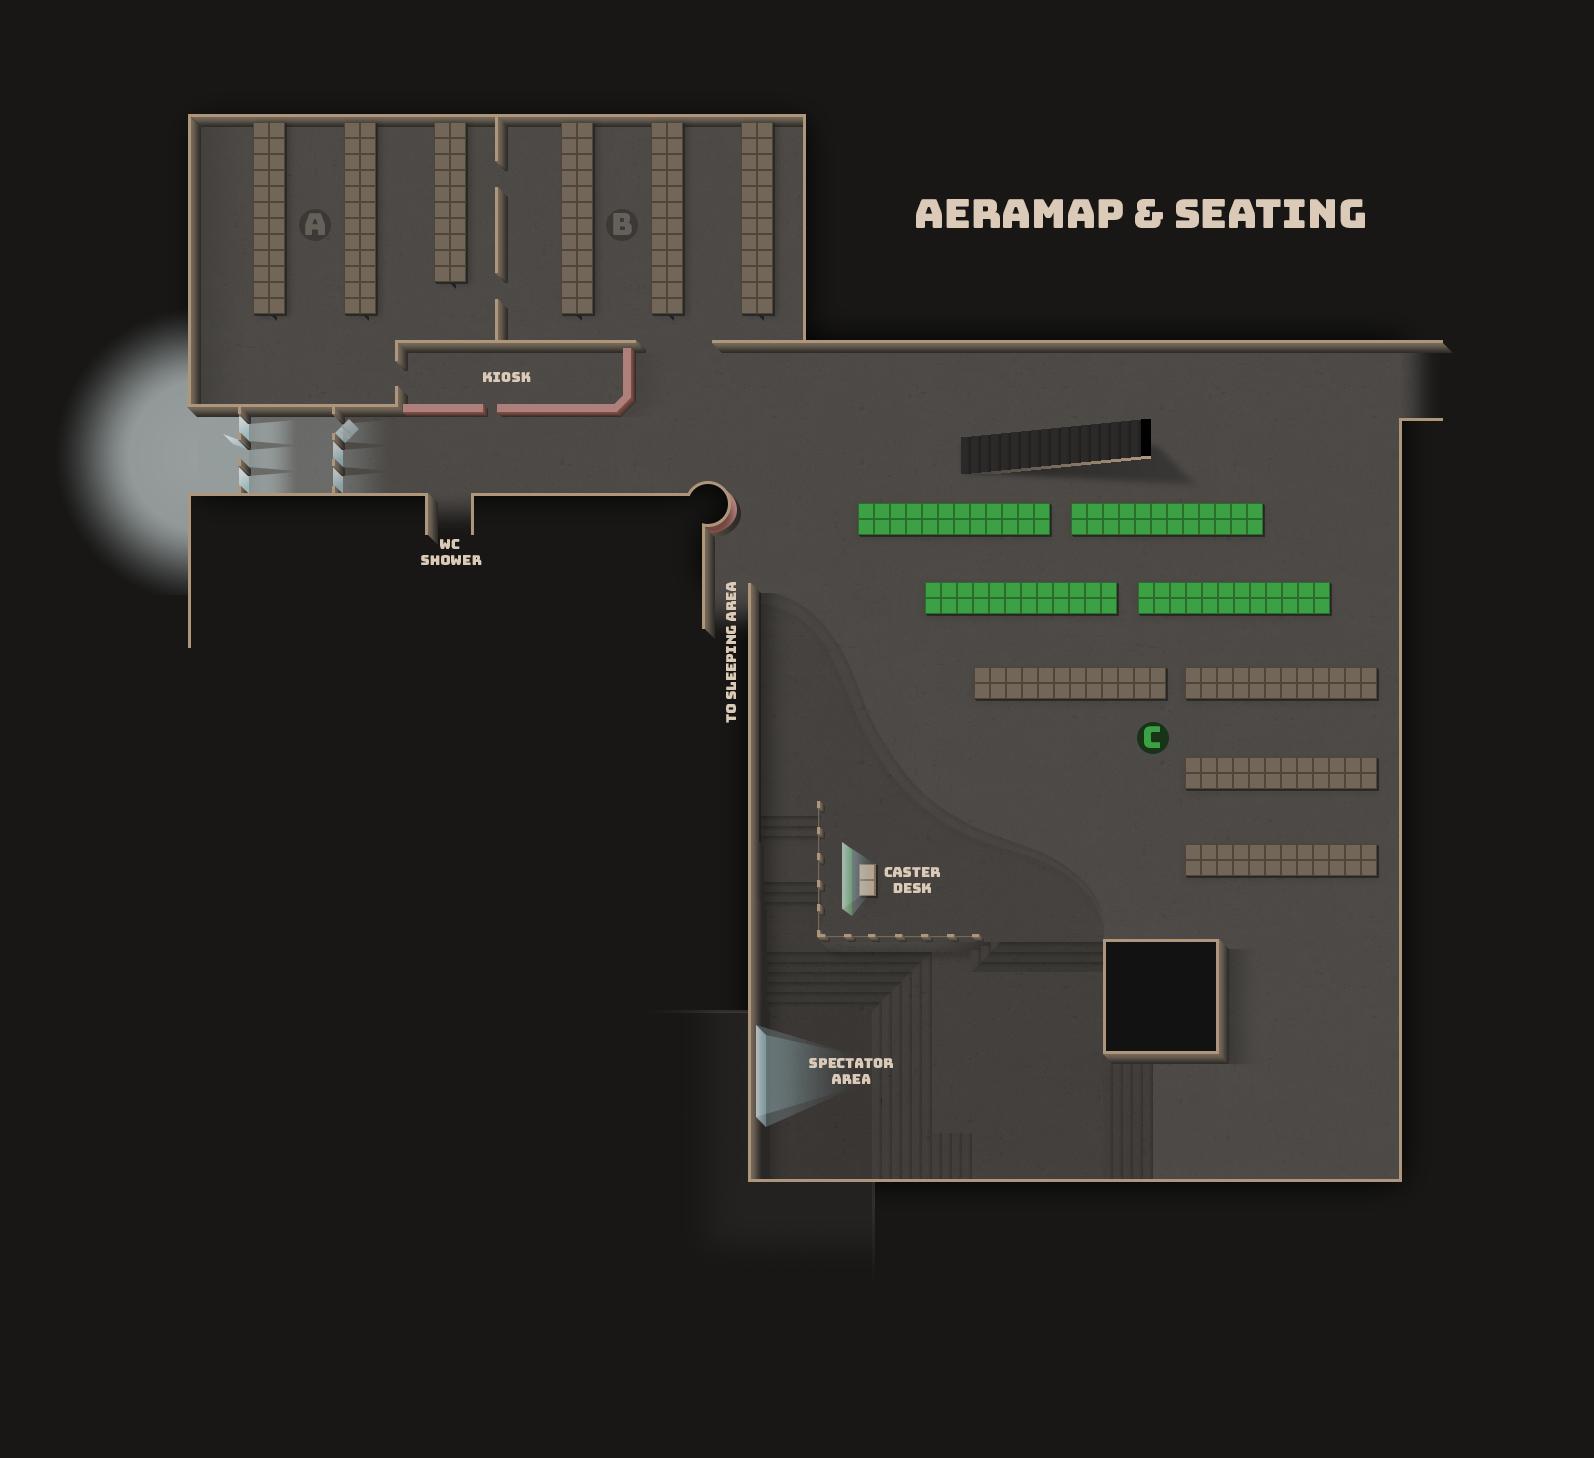 http://blaps.se/qw/qh17/seatmap.png